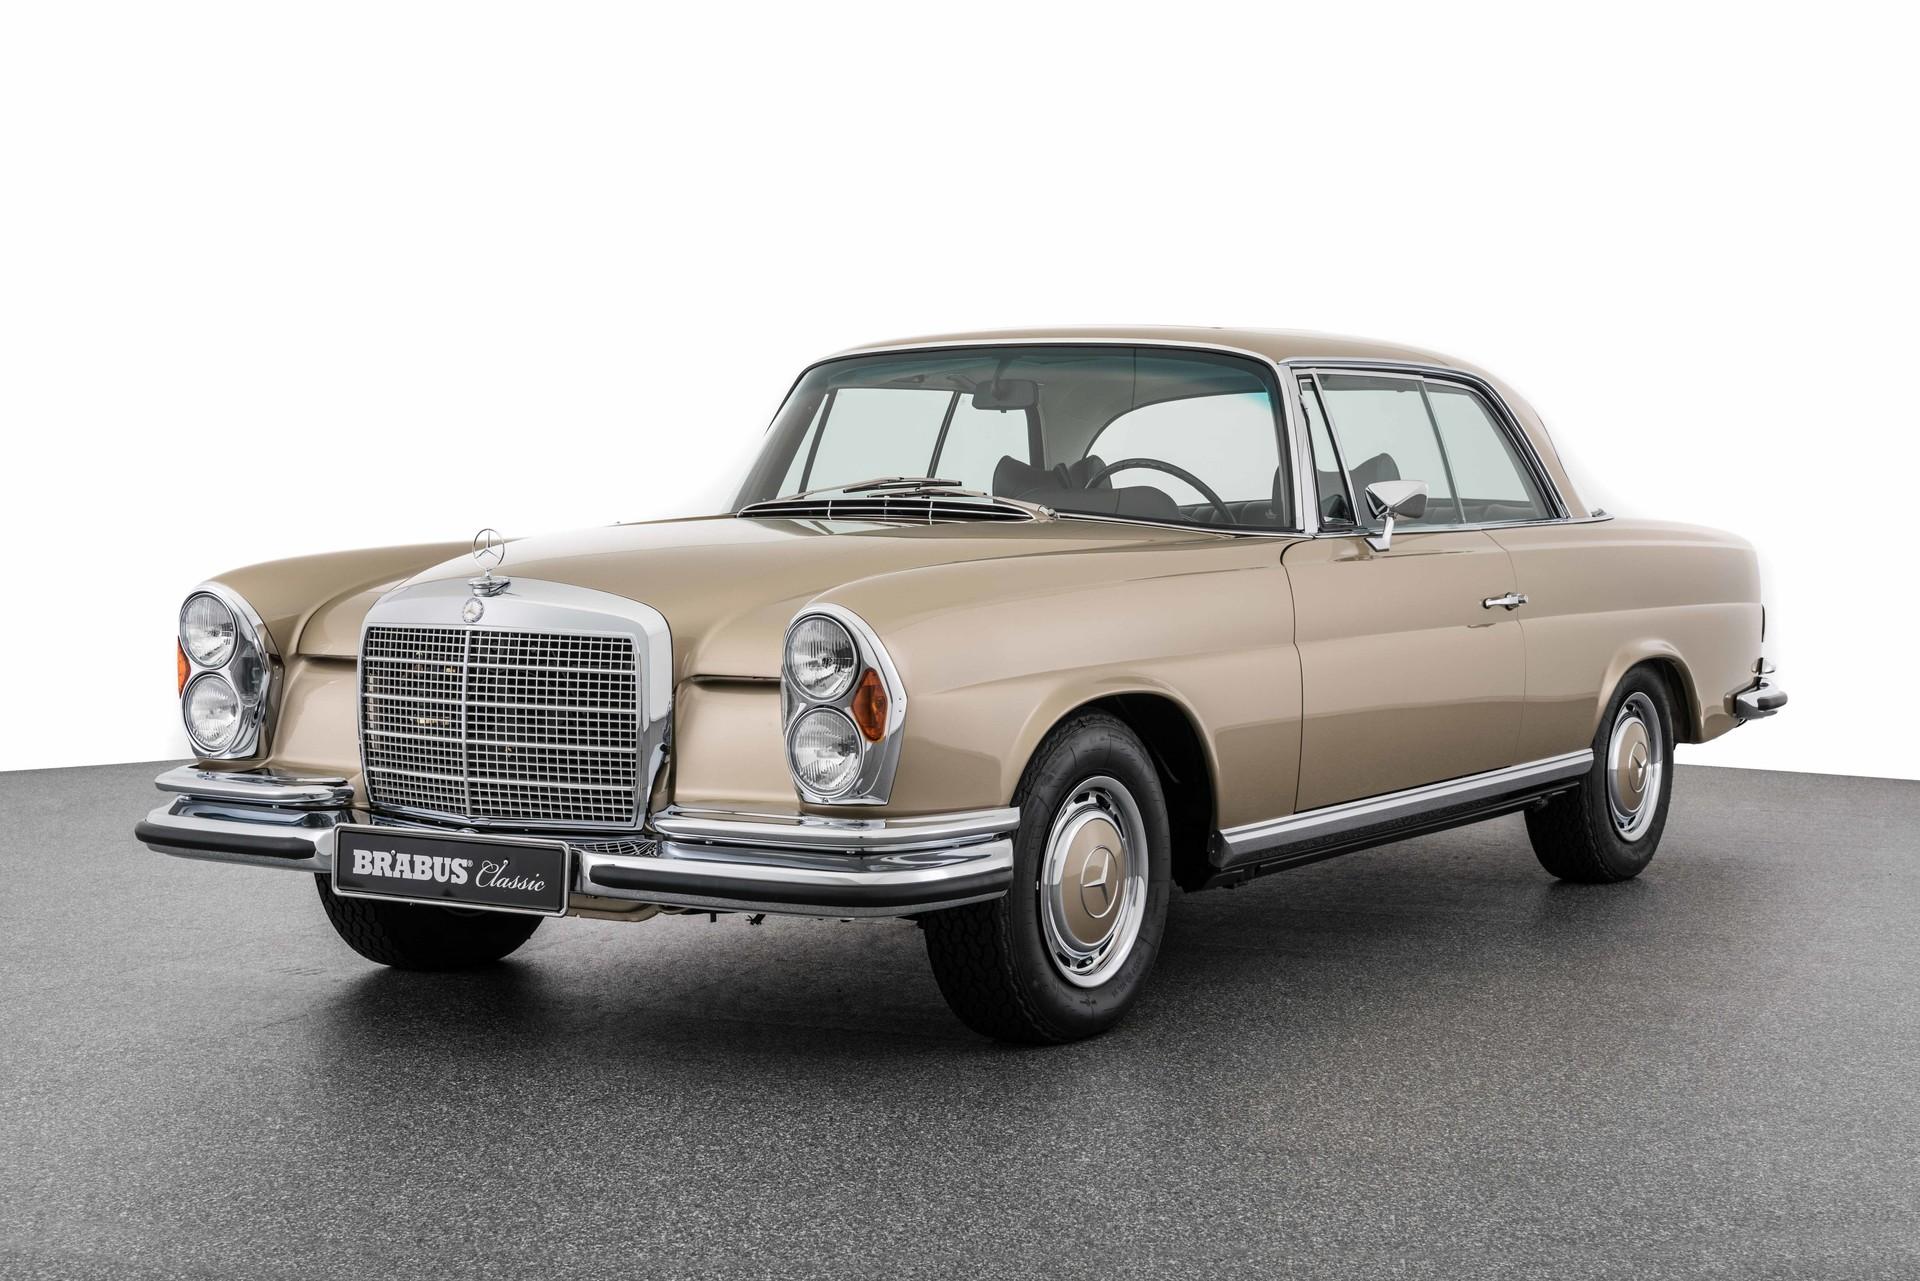 BRABUS Classic – (1969) 280 SE 3.5 COUPÉ – Tunisbeige with dark brown interior